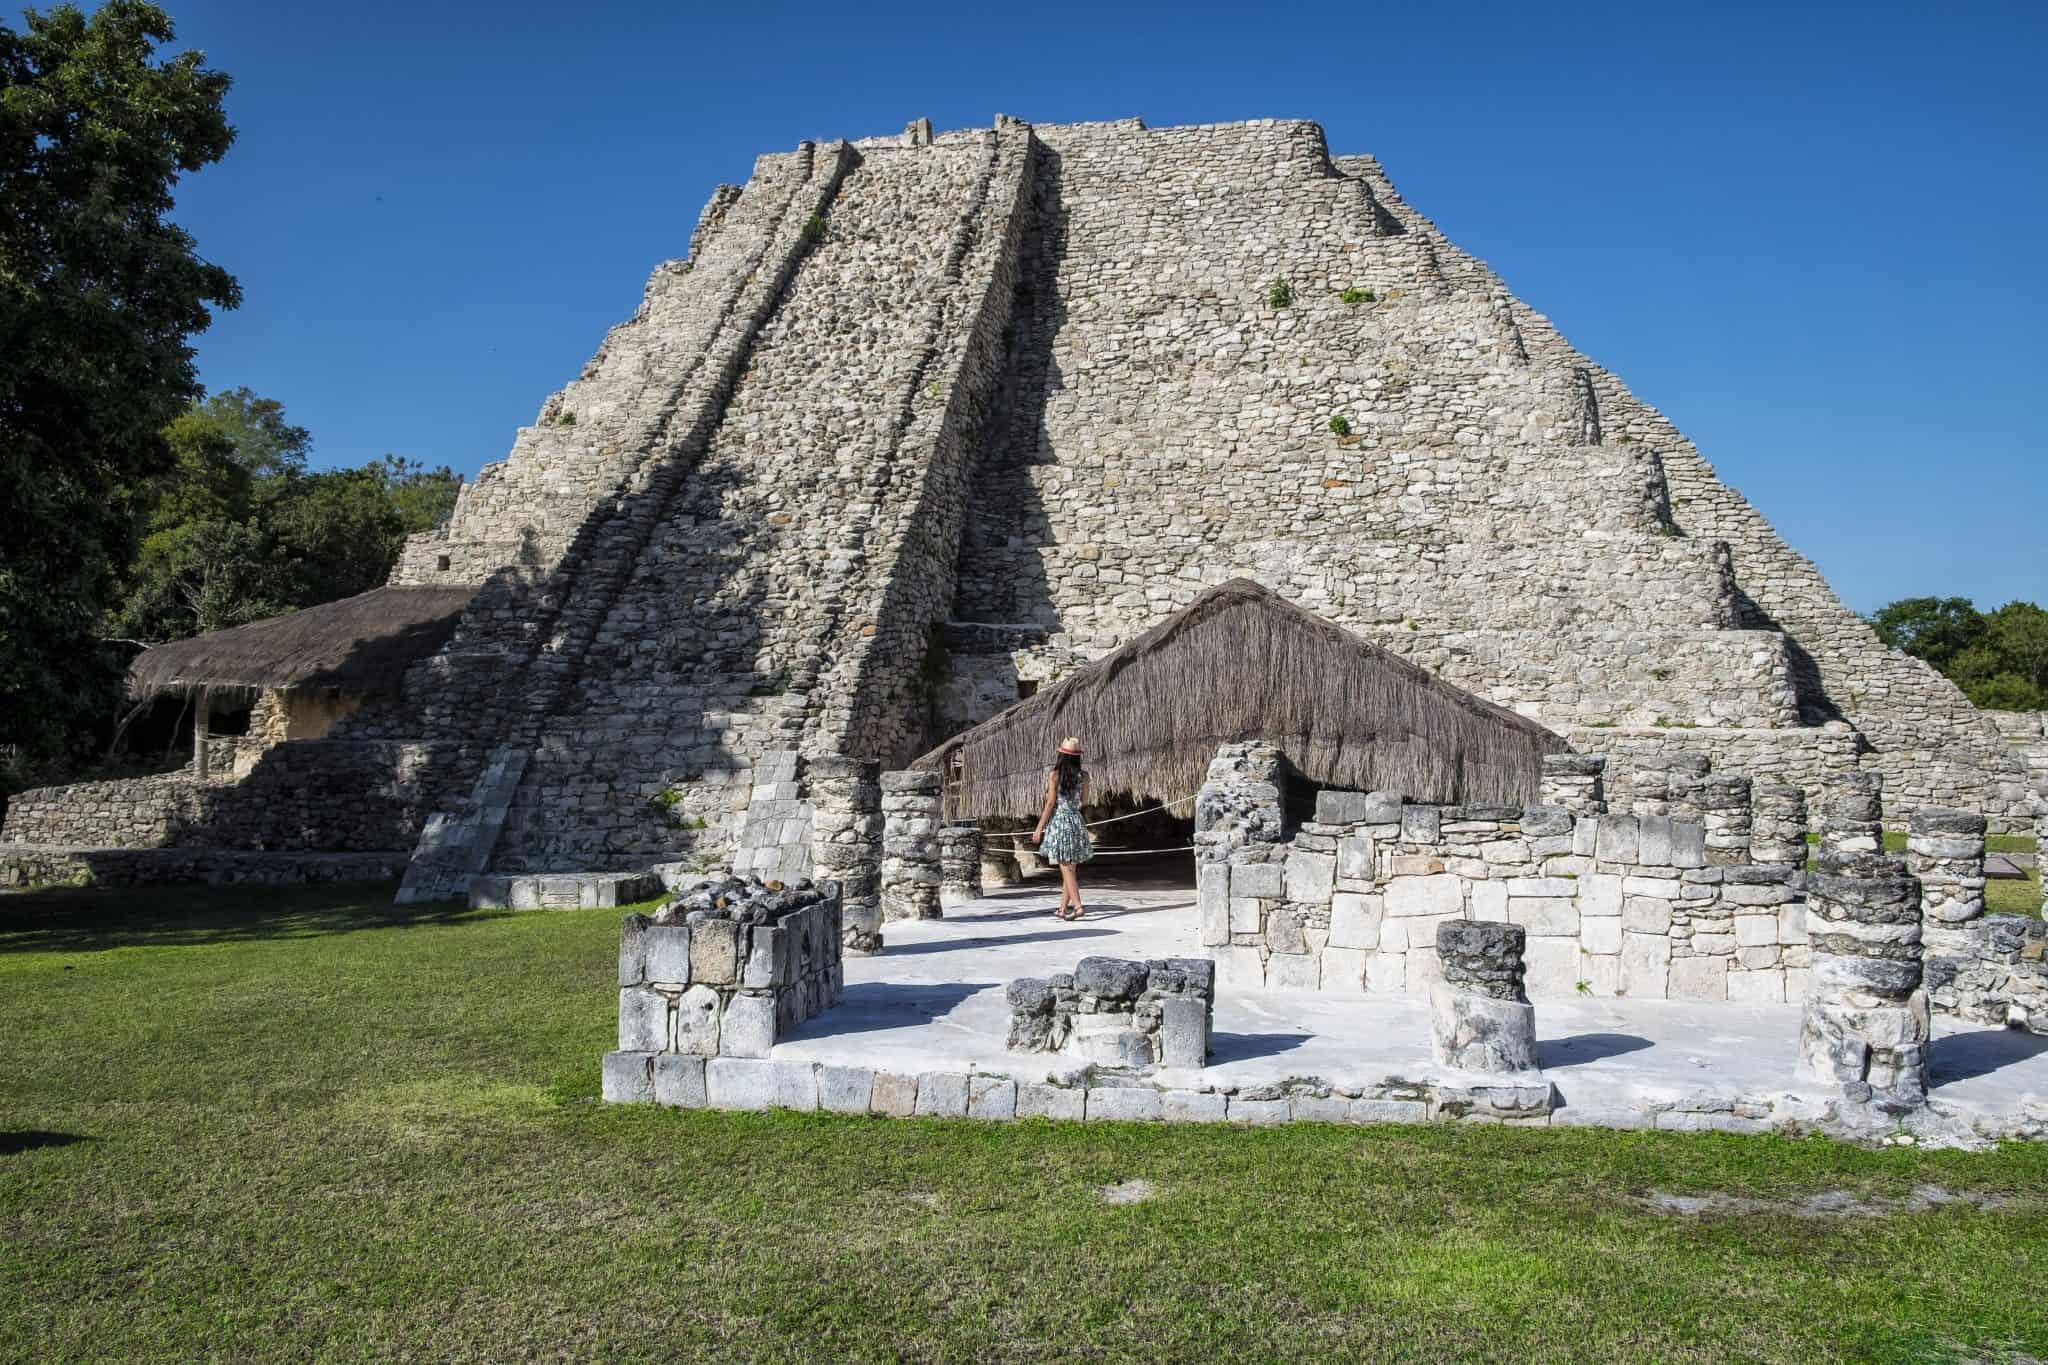 Pirâmide principal de Mayapán